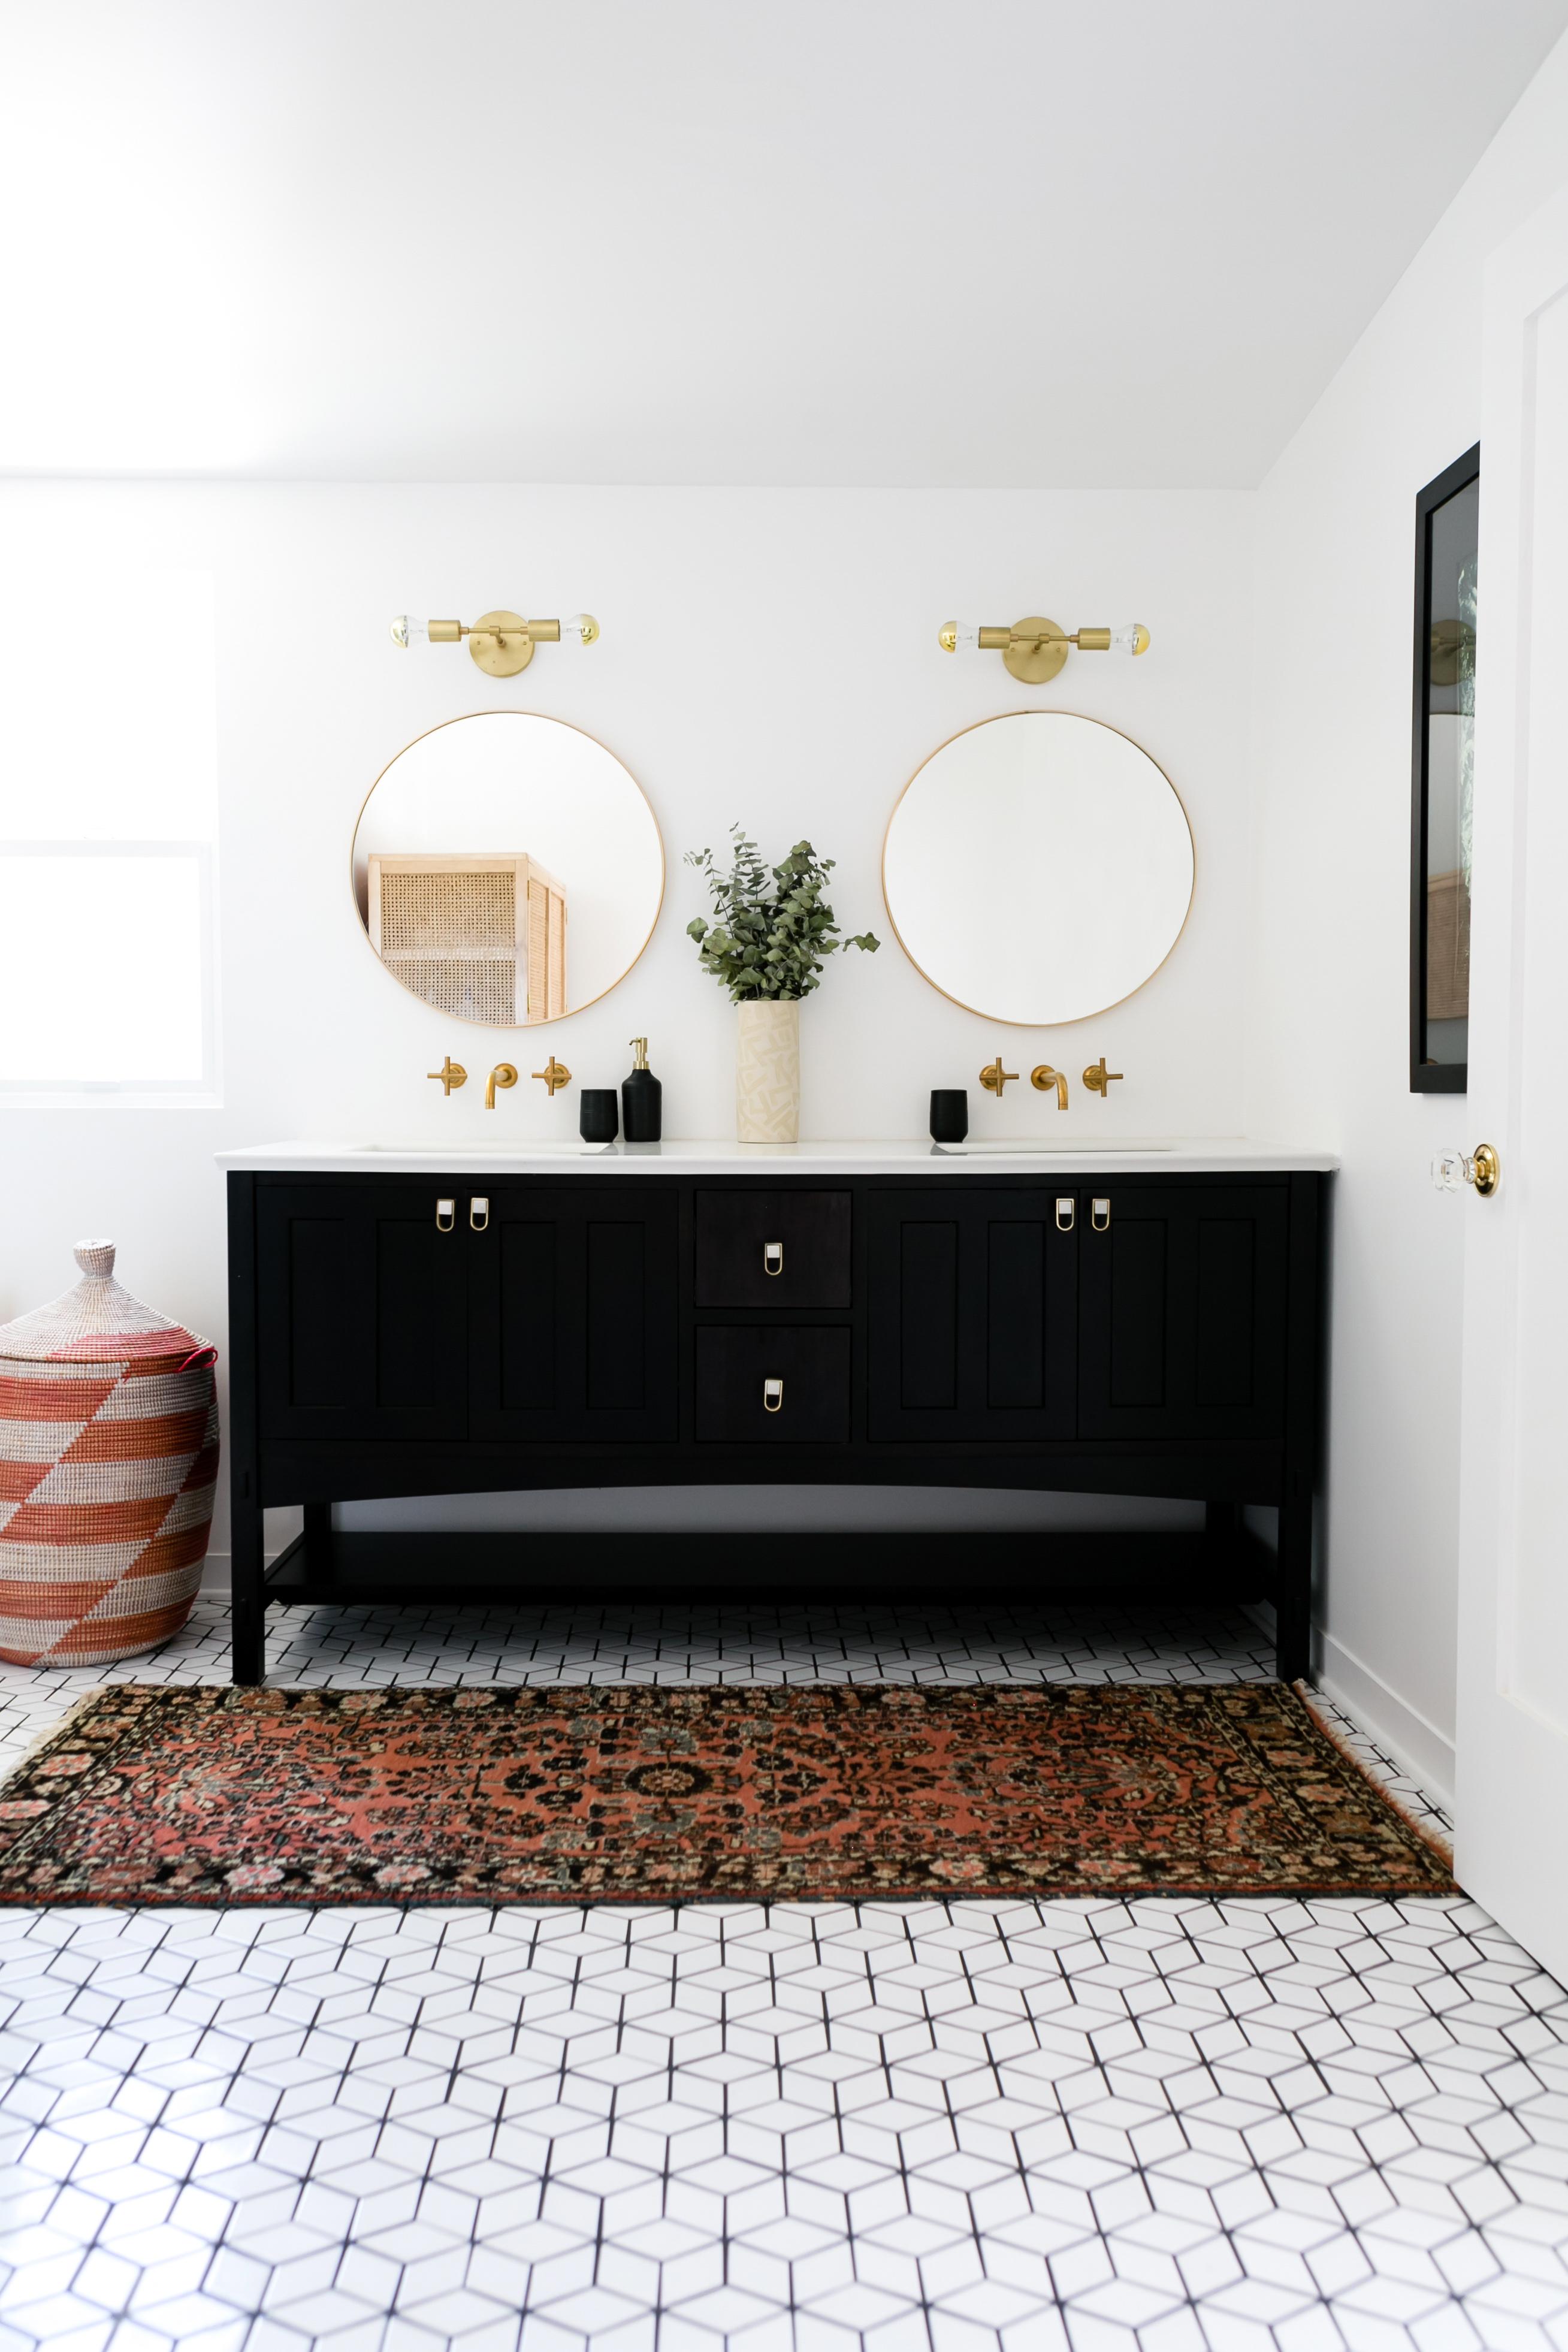 2017_Q2_image_residential_Jaclyn_Johnson_Create_Cultivate_Monica_Wang_Photo_bathroom_floor_tile_mosaics_small_diamonds_white_wash_1.jpg?mtime=20180610115215#asset:266153